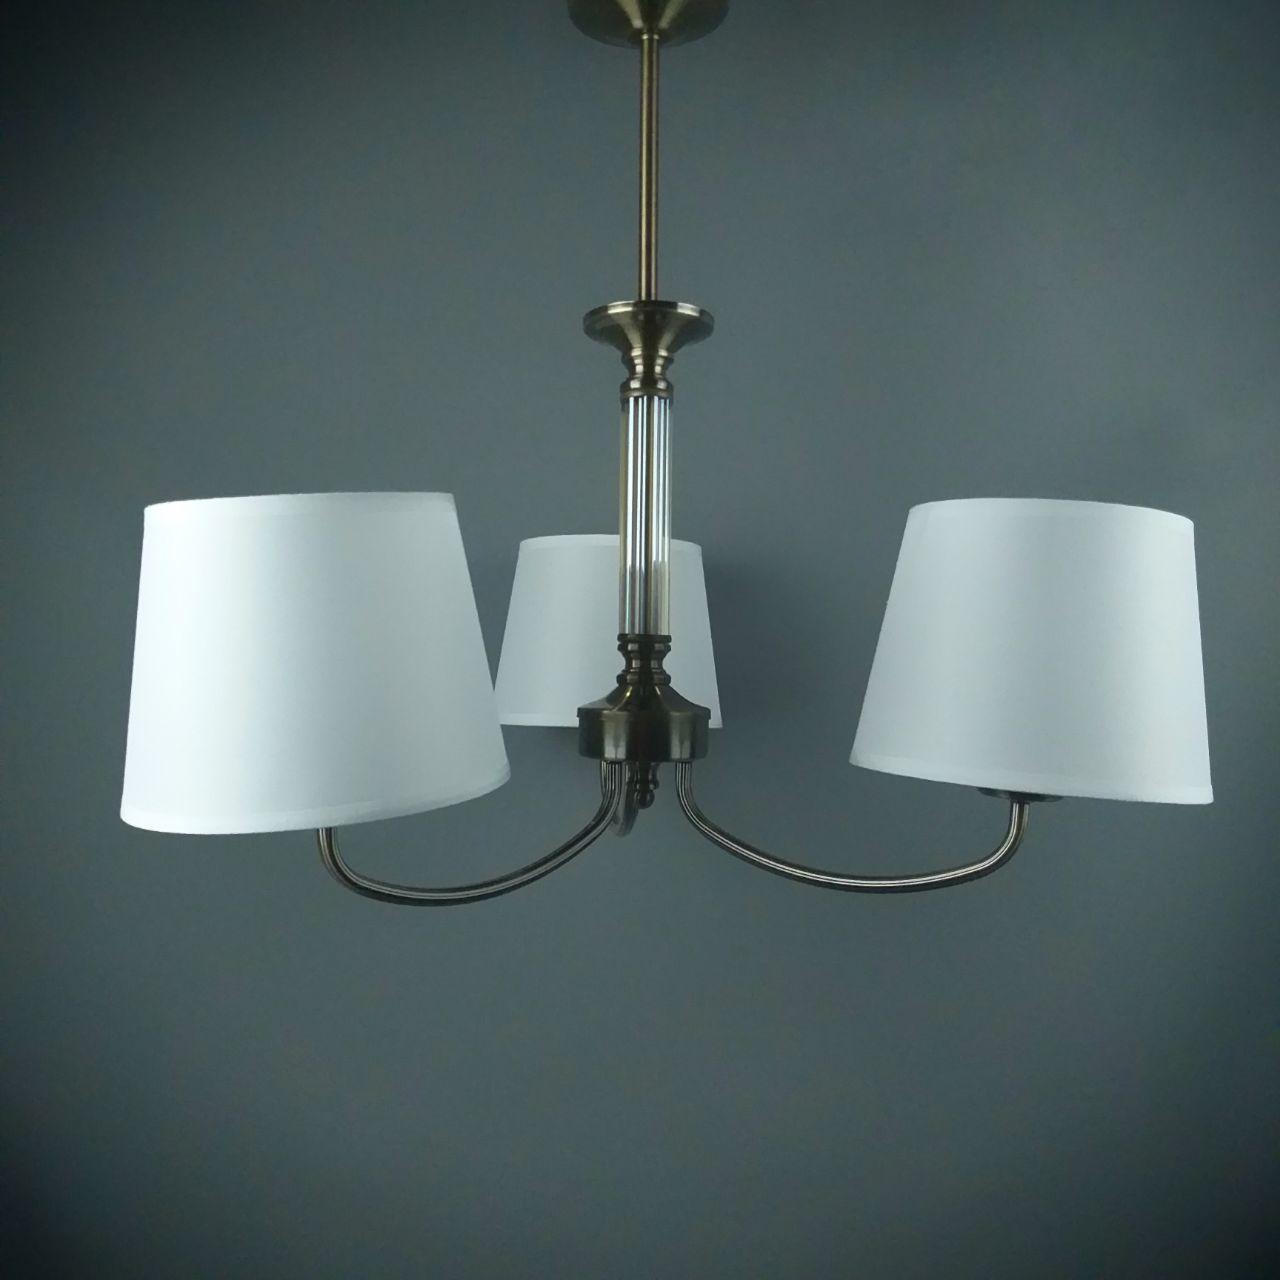 Люстра подвесная на 3 лампы 06-8923/3 AB+WT